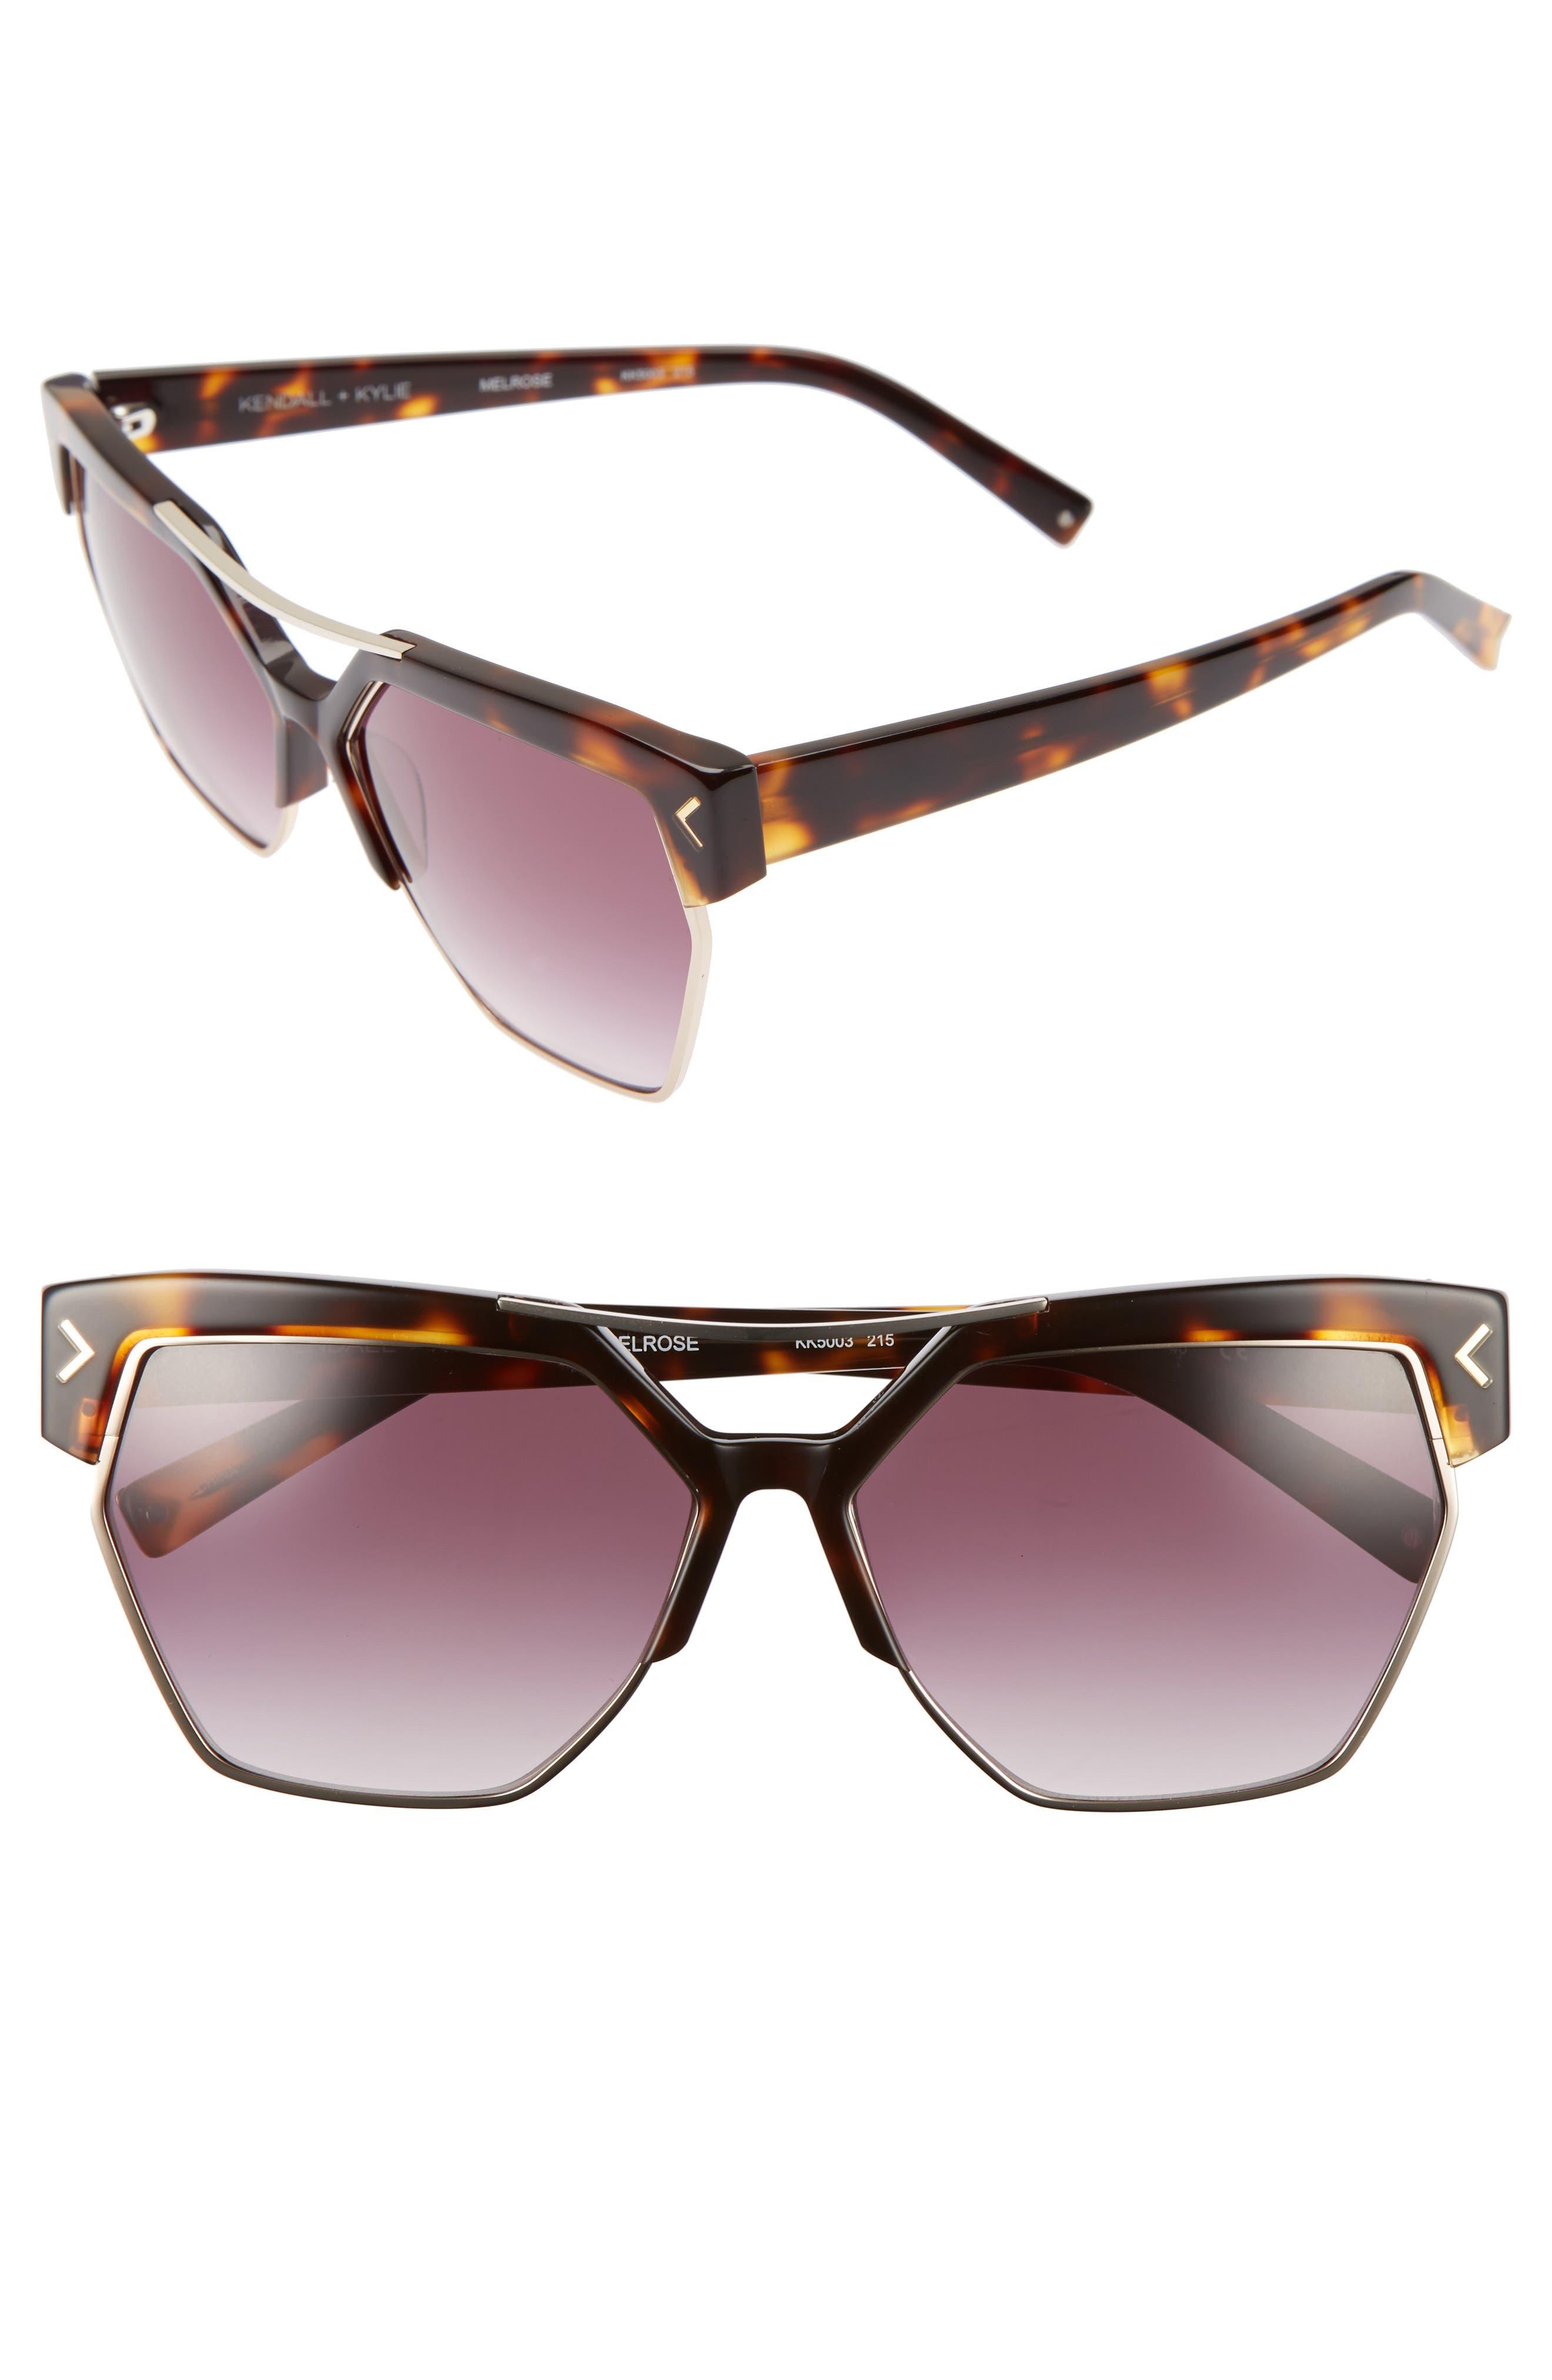 55mm Retro Sunglasses,                             Main thumbnail 3, color,